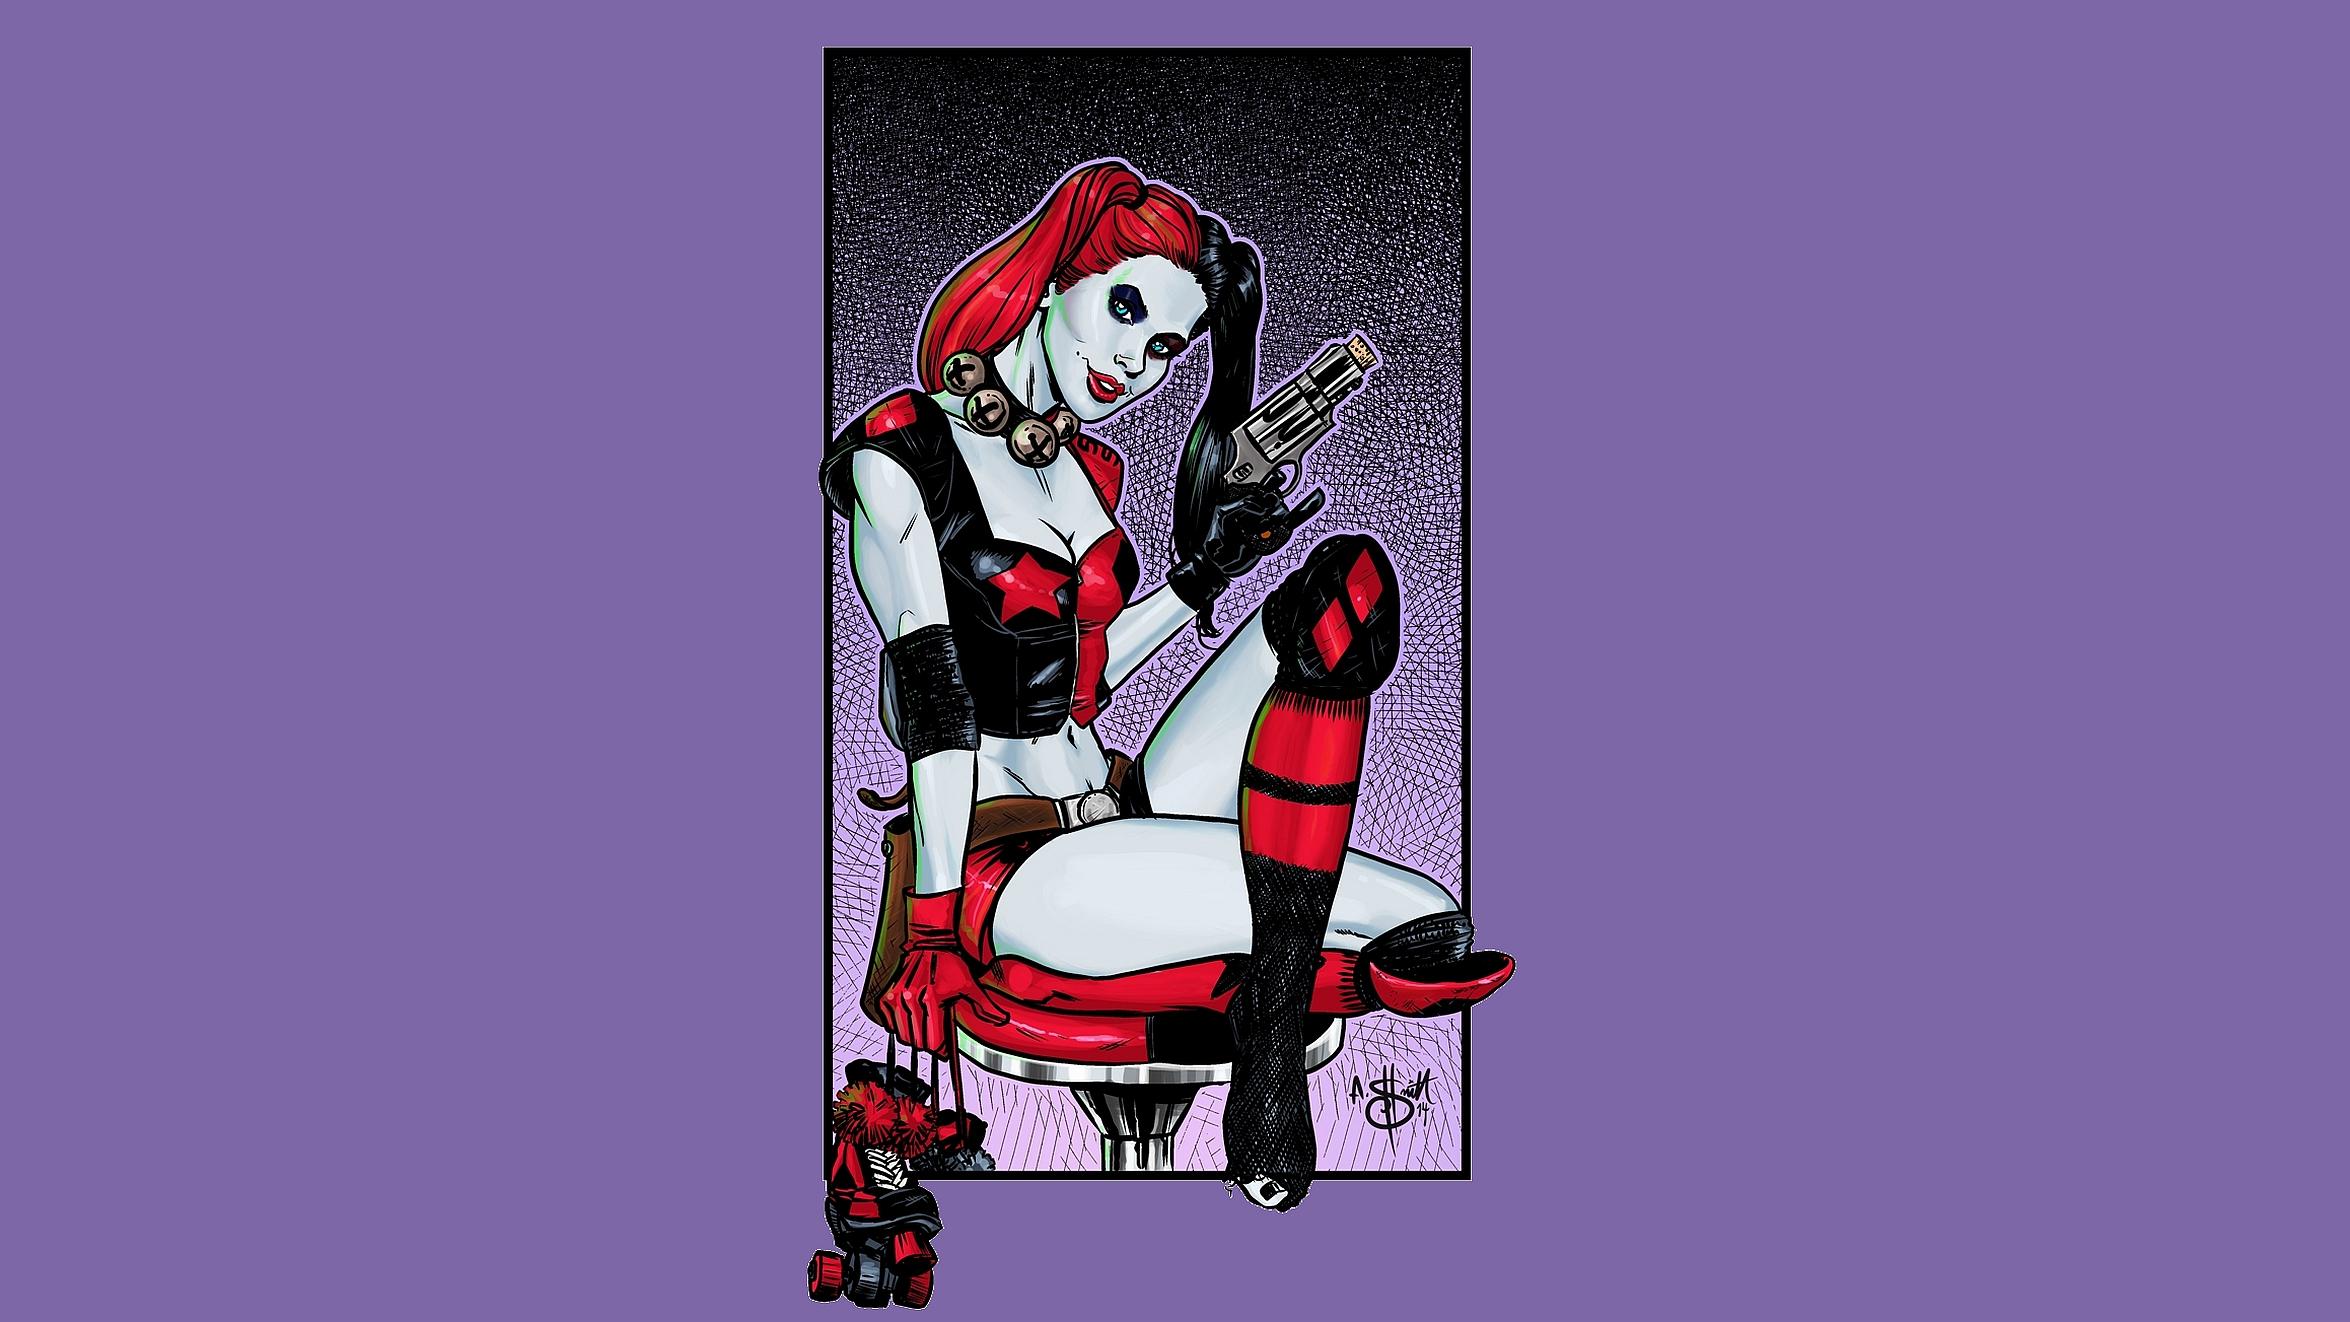 Harley Quinn Computer Wallpapers Desktop Backgrounds 2350x1322 ID 2350x1322